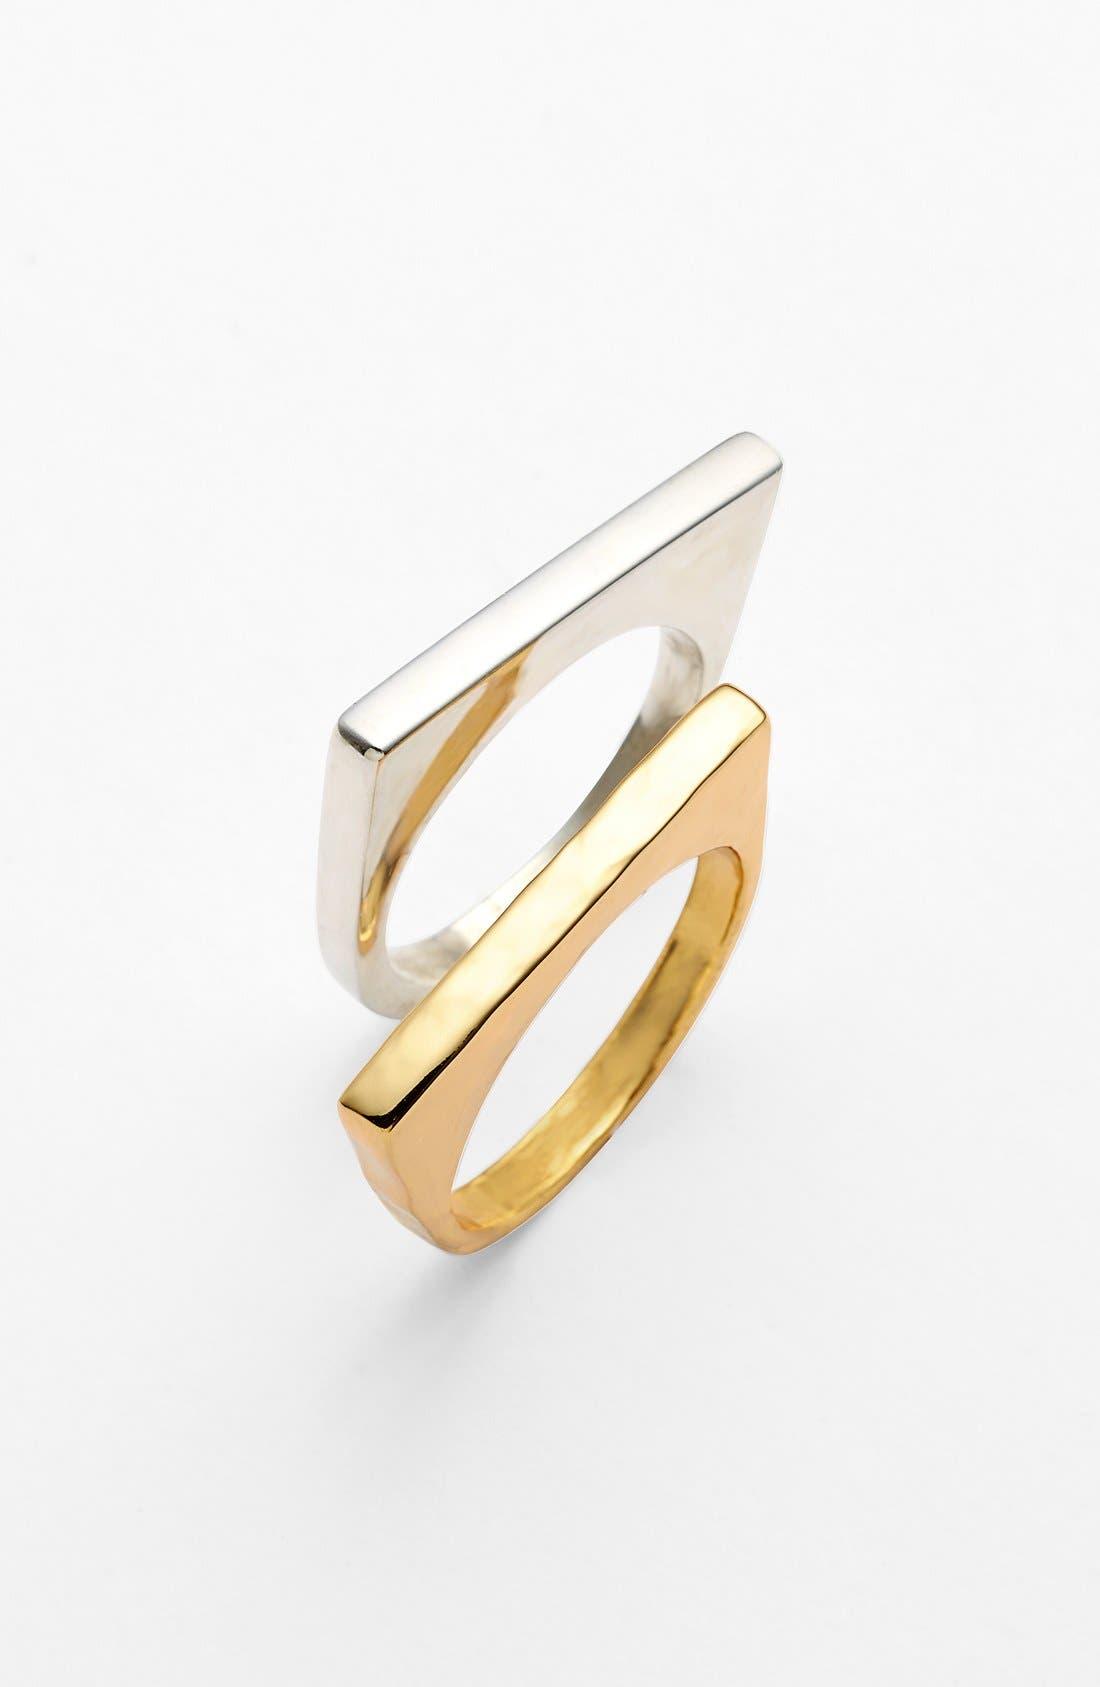 Main Image - Argento Vivo Straight Edge Rings (Set of 2)